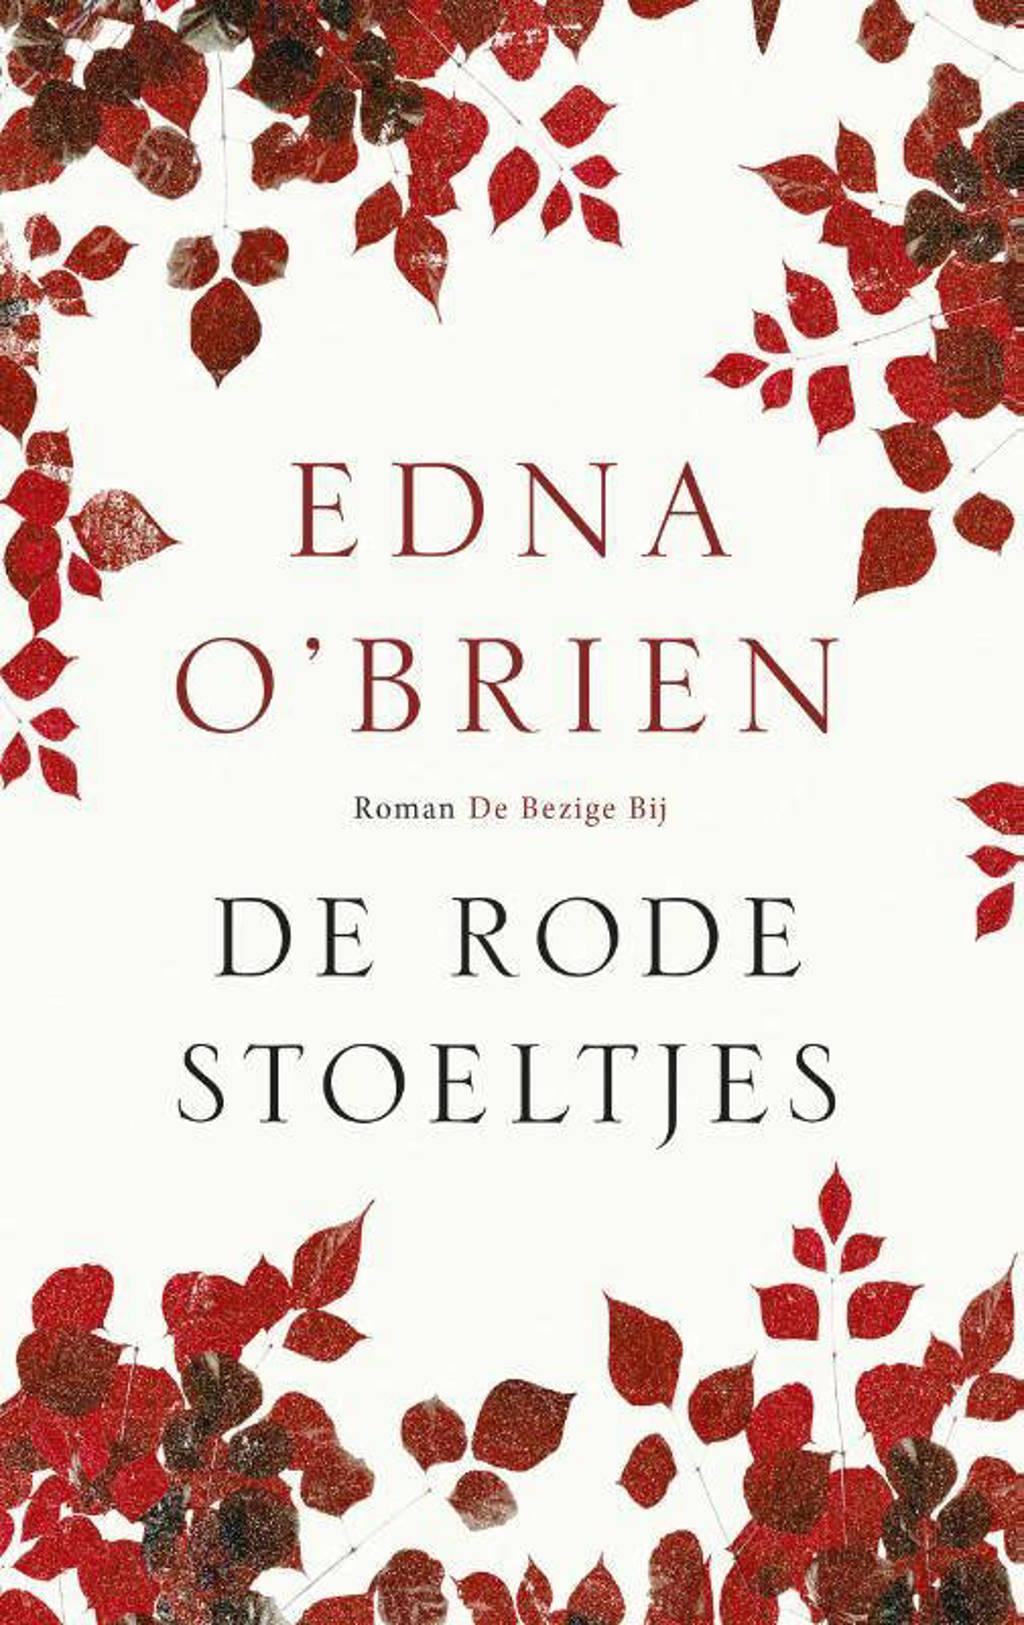 De rode stoeltjes - Edna O'Brien